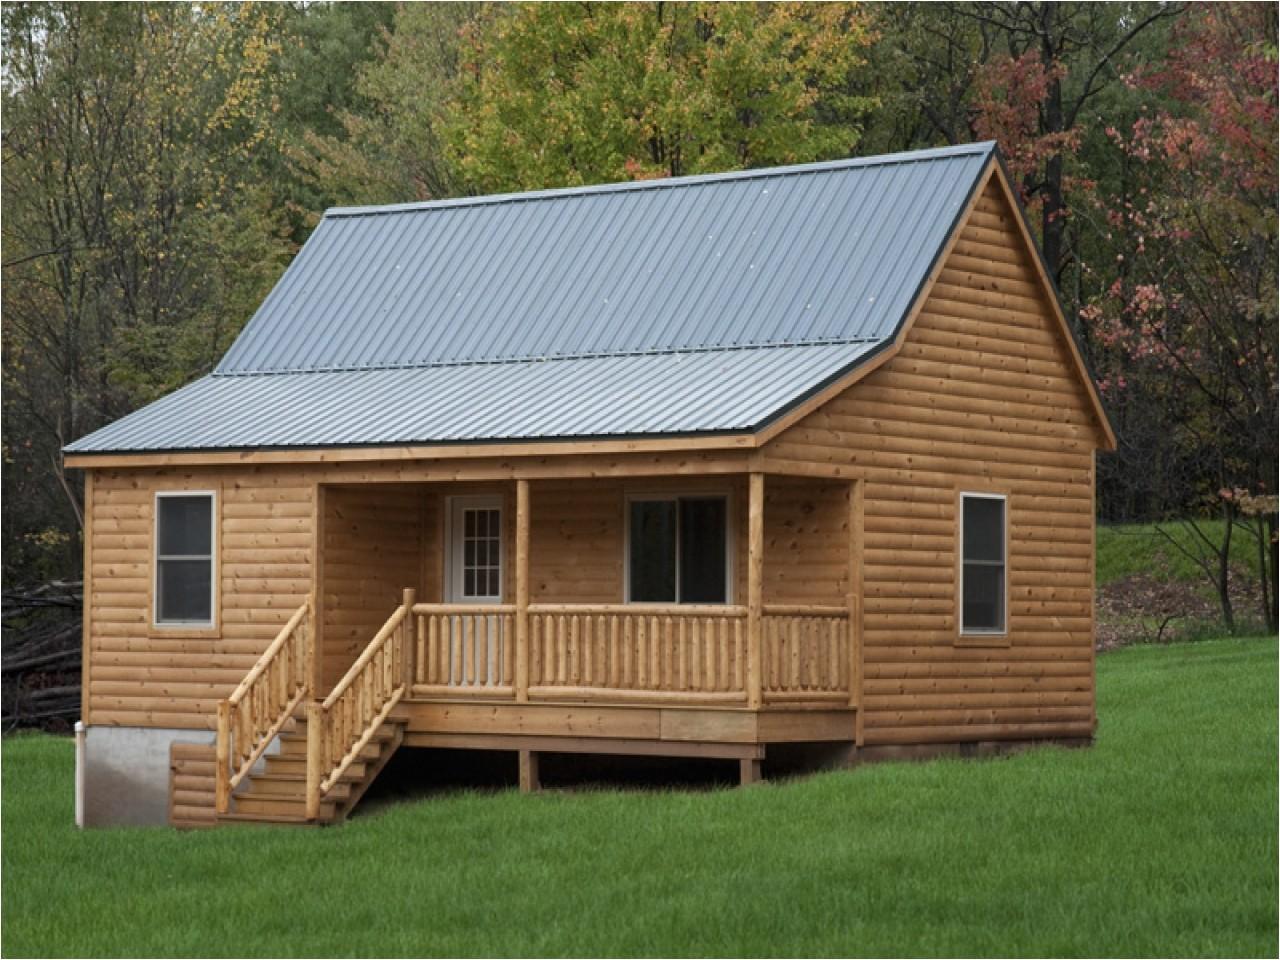 5c3e9867f49d1da6 tuff shed cabin floor plans tuff shed cabin floor plans